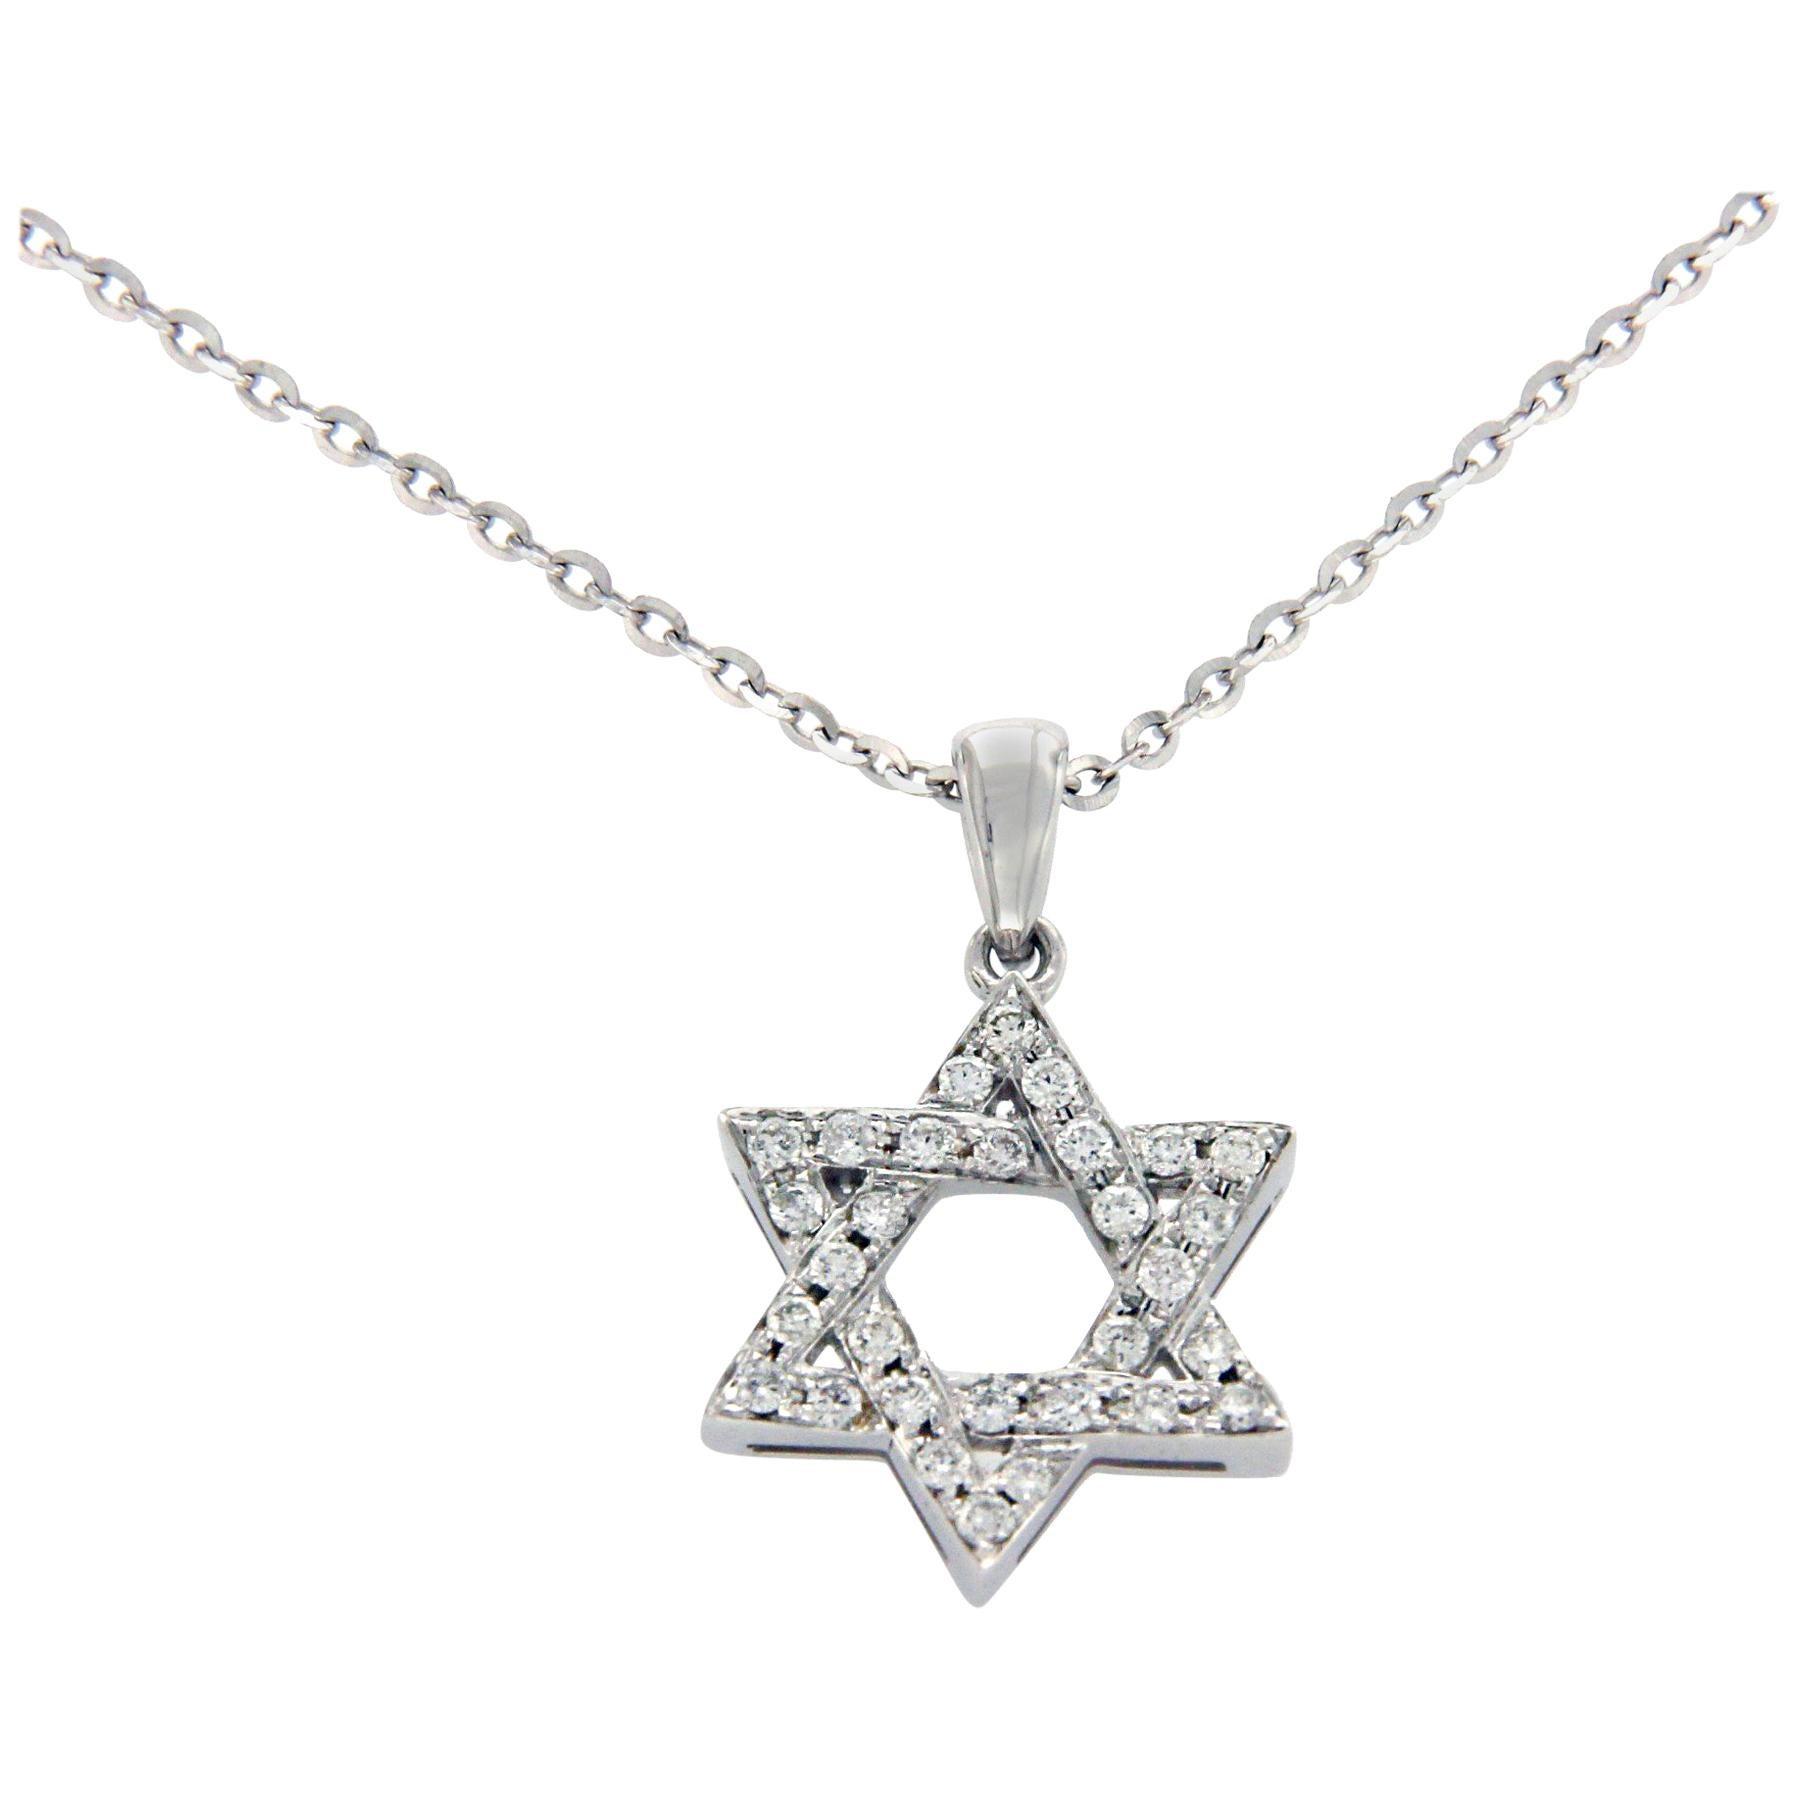 NO Chain 14k White,Yellow or Rose Gold Star of David Diamond Pendant 0.09ct